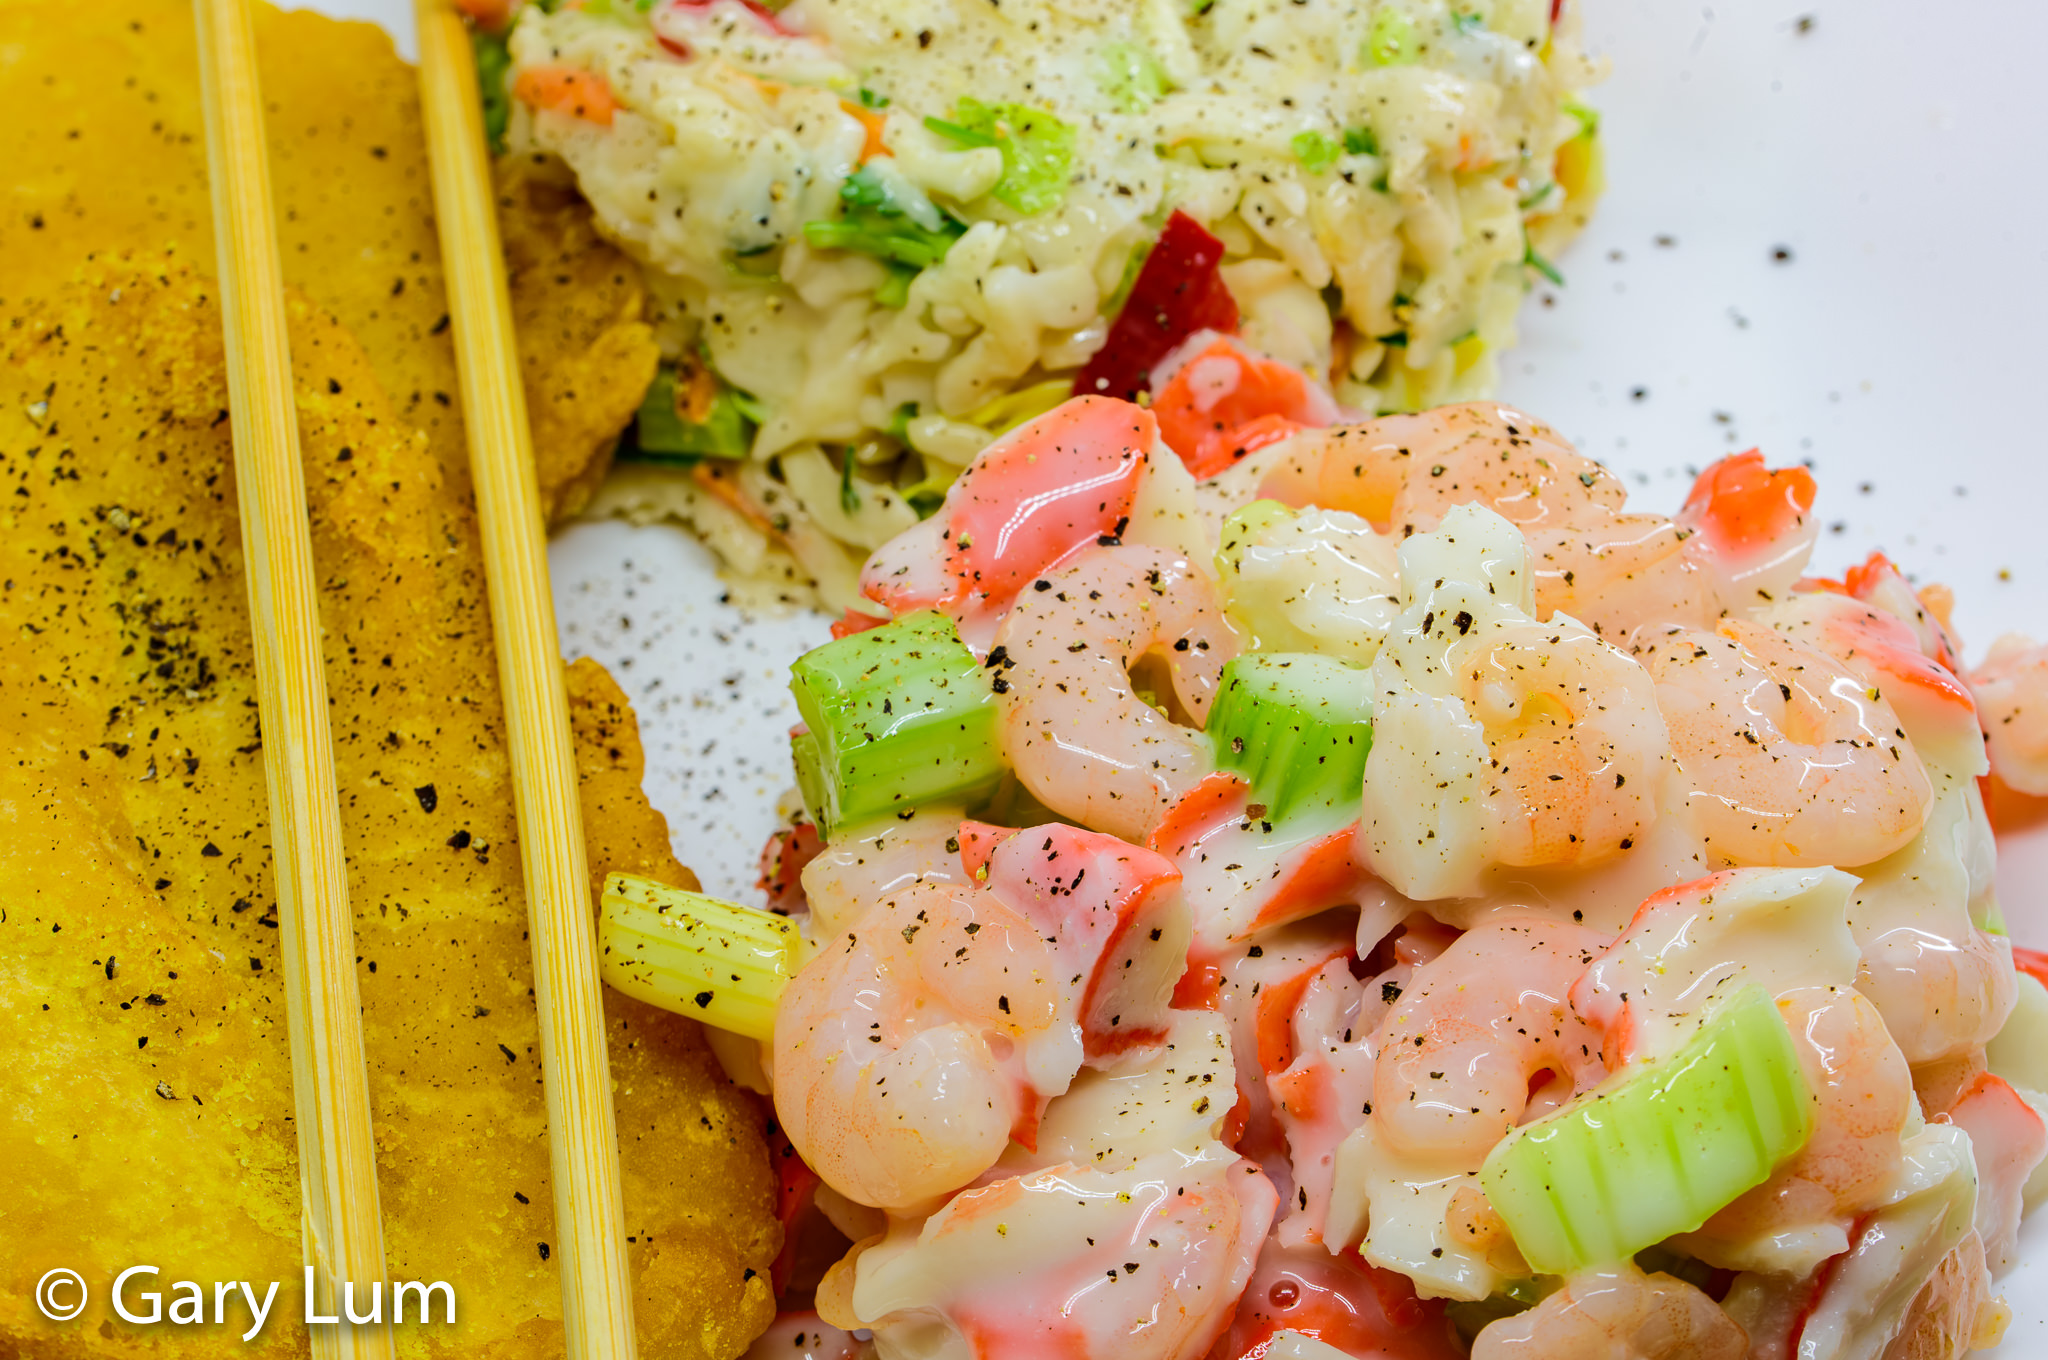 Close up. Takeaway potato scallops, seafood salad, and coleslaw. Gary Lum.